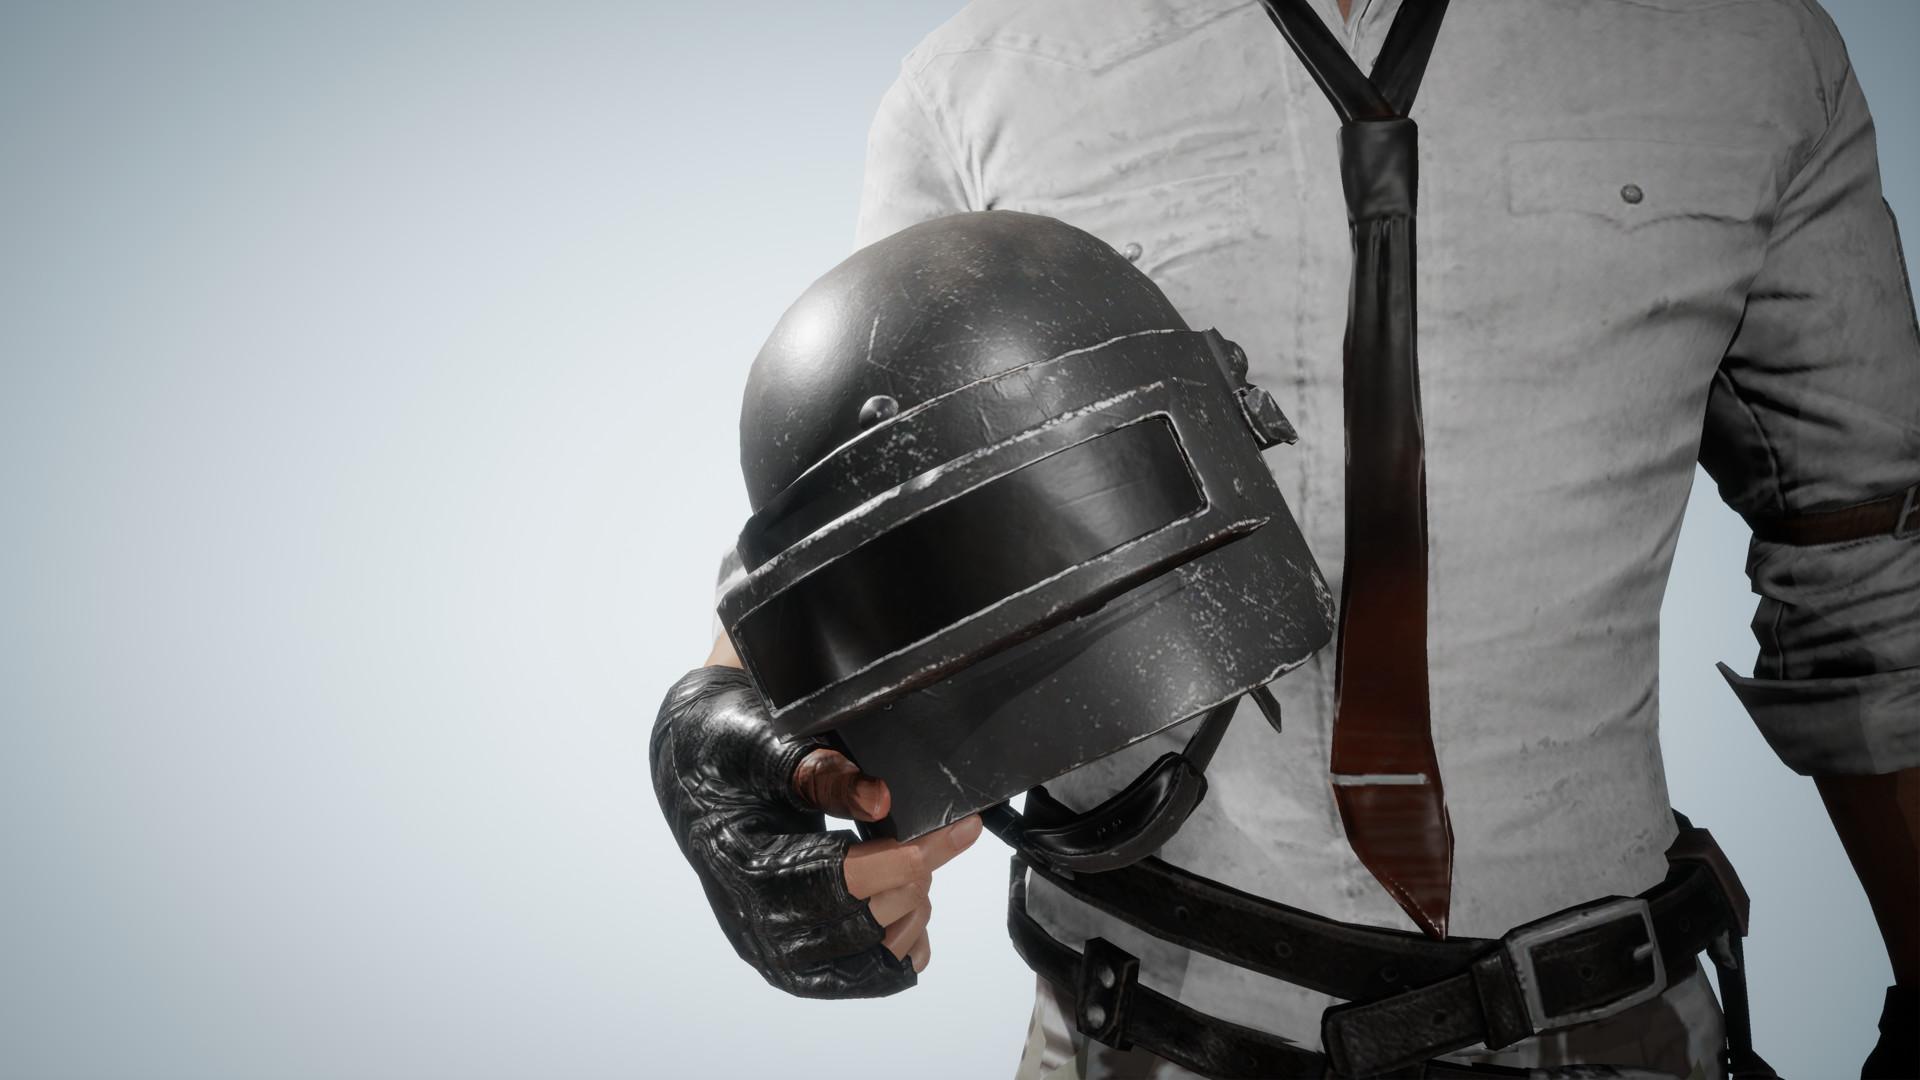 Pubg Helmet Man With Pan 4k Hd Games 4k Wallpapers: Wallpaper Pubg Equipman